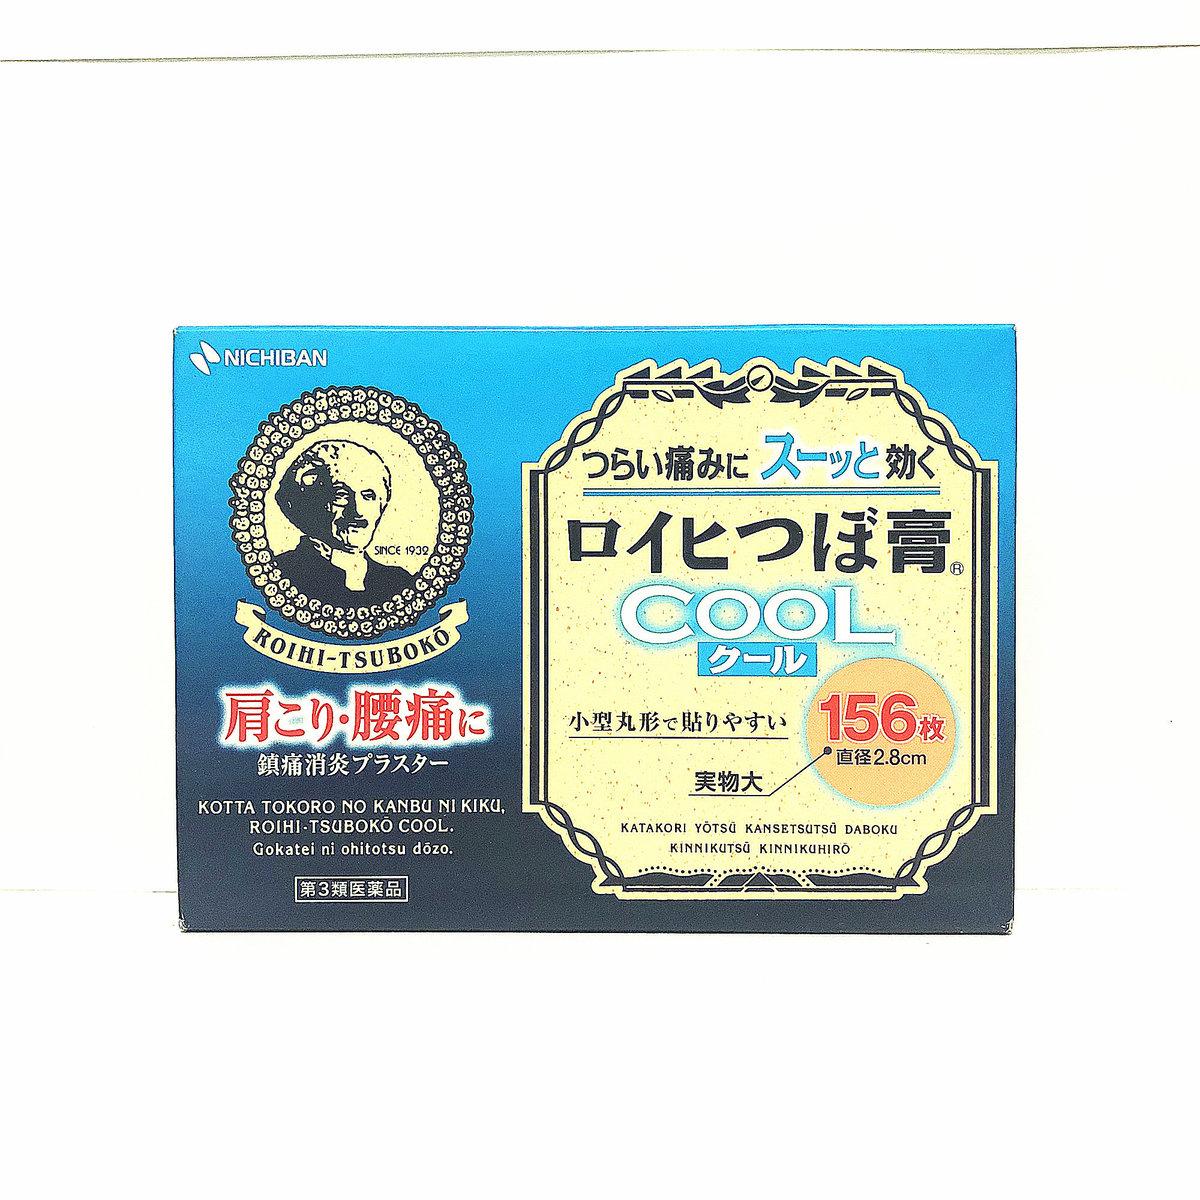 Japan roihi-tsuboko cold shoulder pain back pain patch 156 sticks